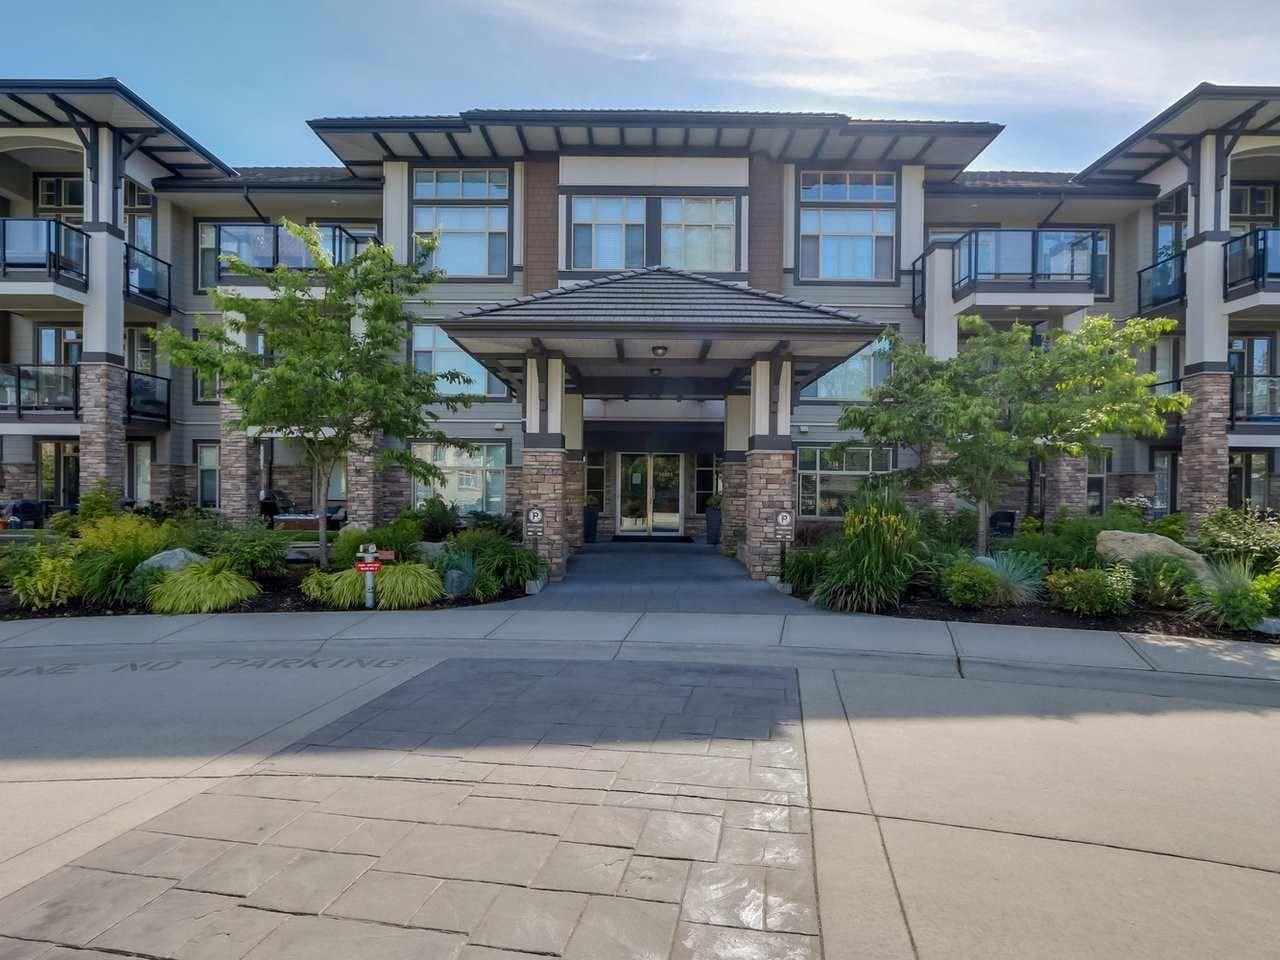 "Main Photo: 211 15185 36 Avenue in Surrey: Morgan Creek Condo for sale in ""EDGEWATER"" (South Surrey White Rock)  : MLS®# R2069499"